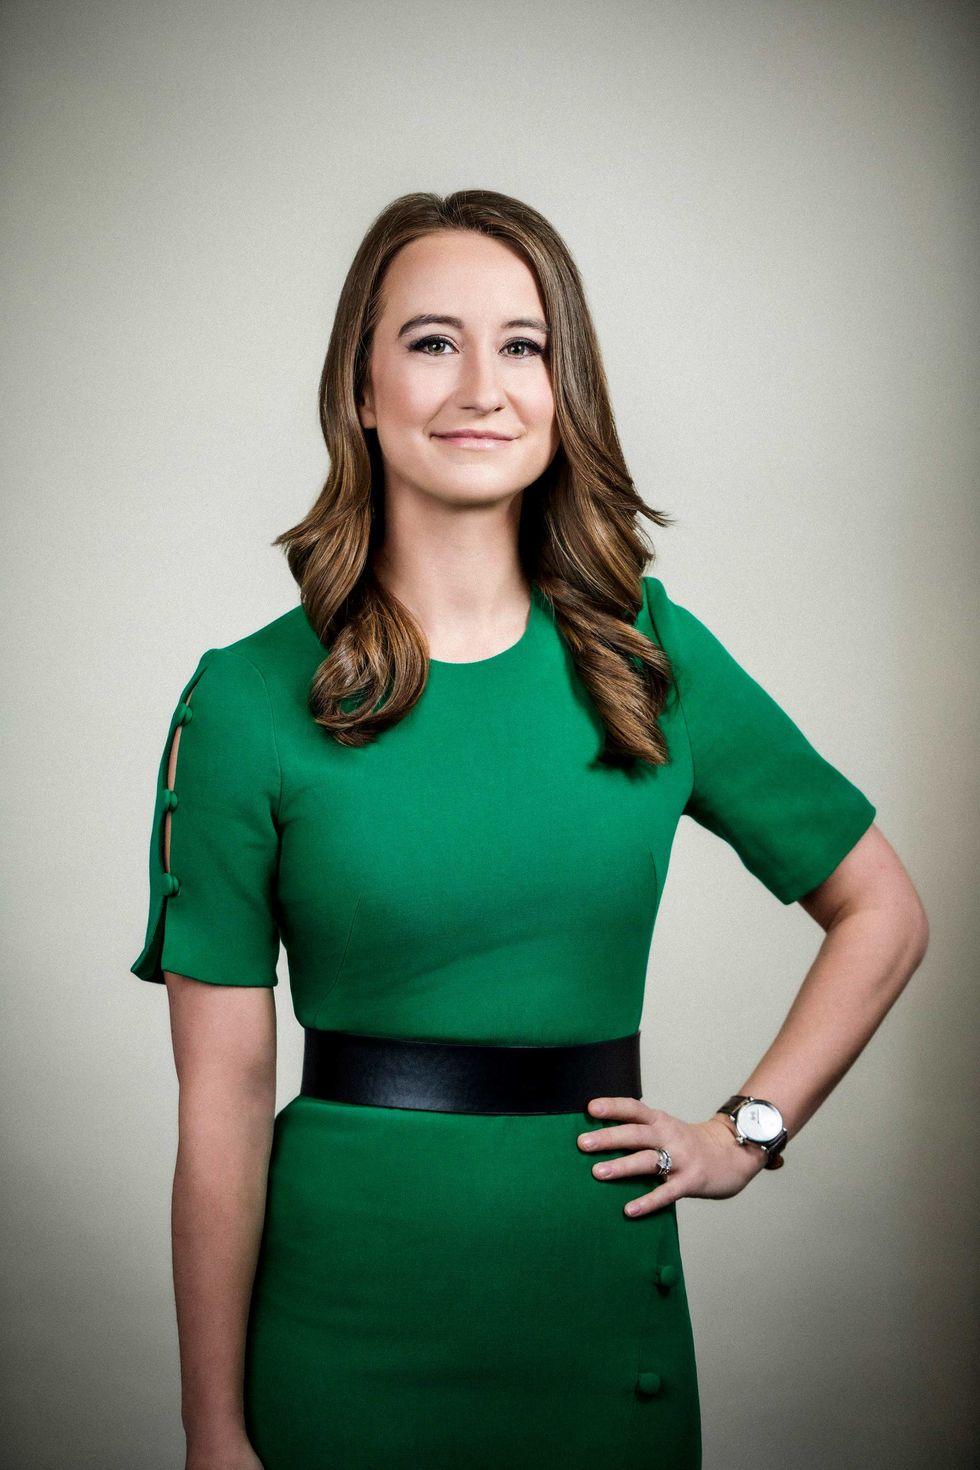 \u200bCBSN reporter Kate Smith.